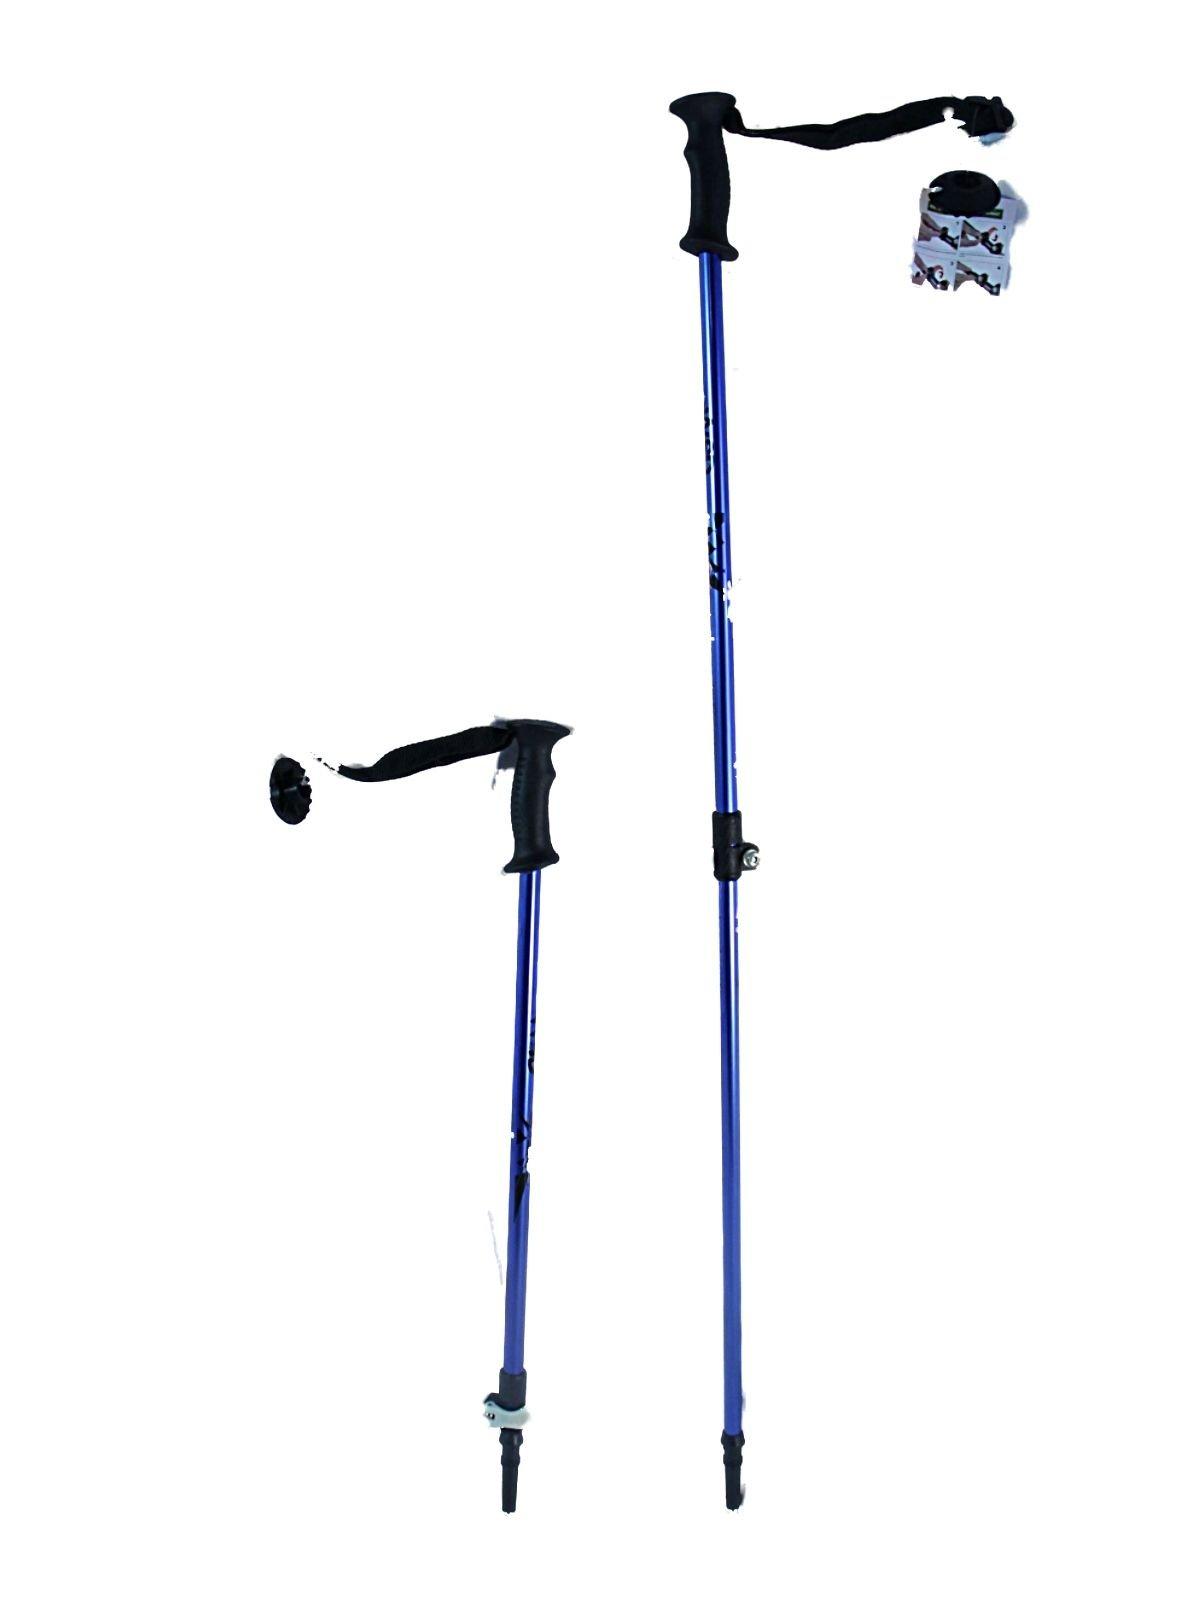 WSD Ski poles Speedlock alpine/downhill Kids Junior size adjustable telescopic ski poles pair with baskets